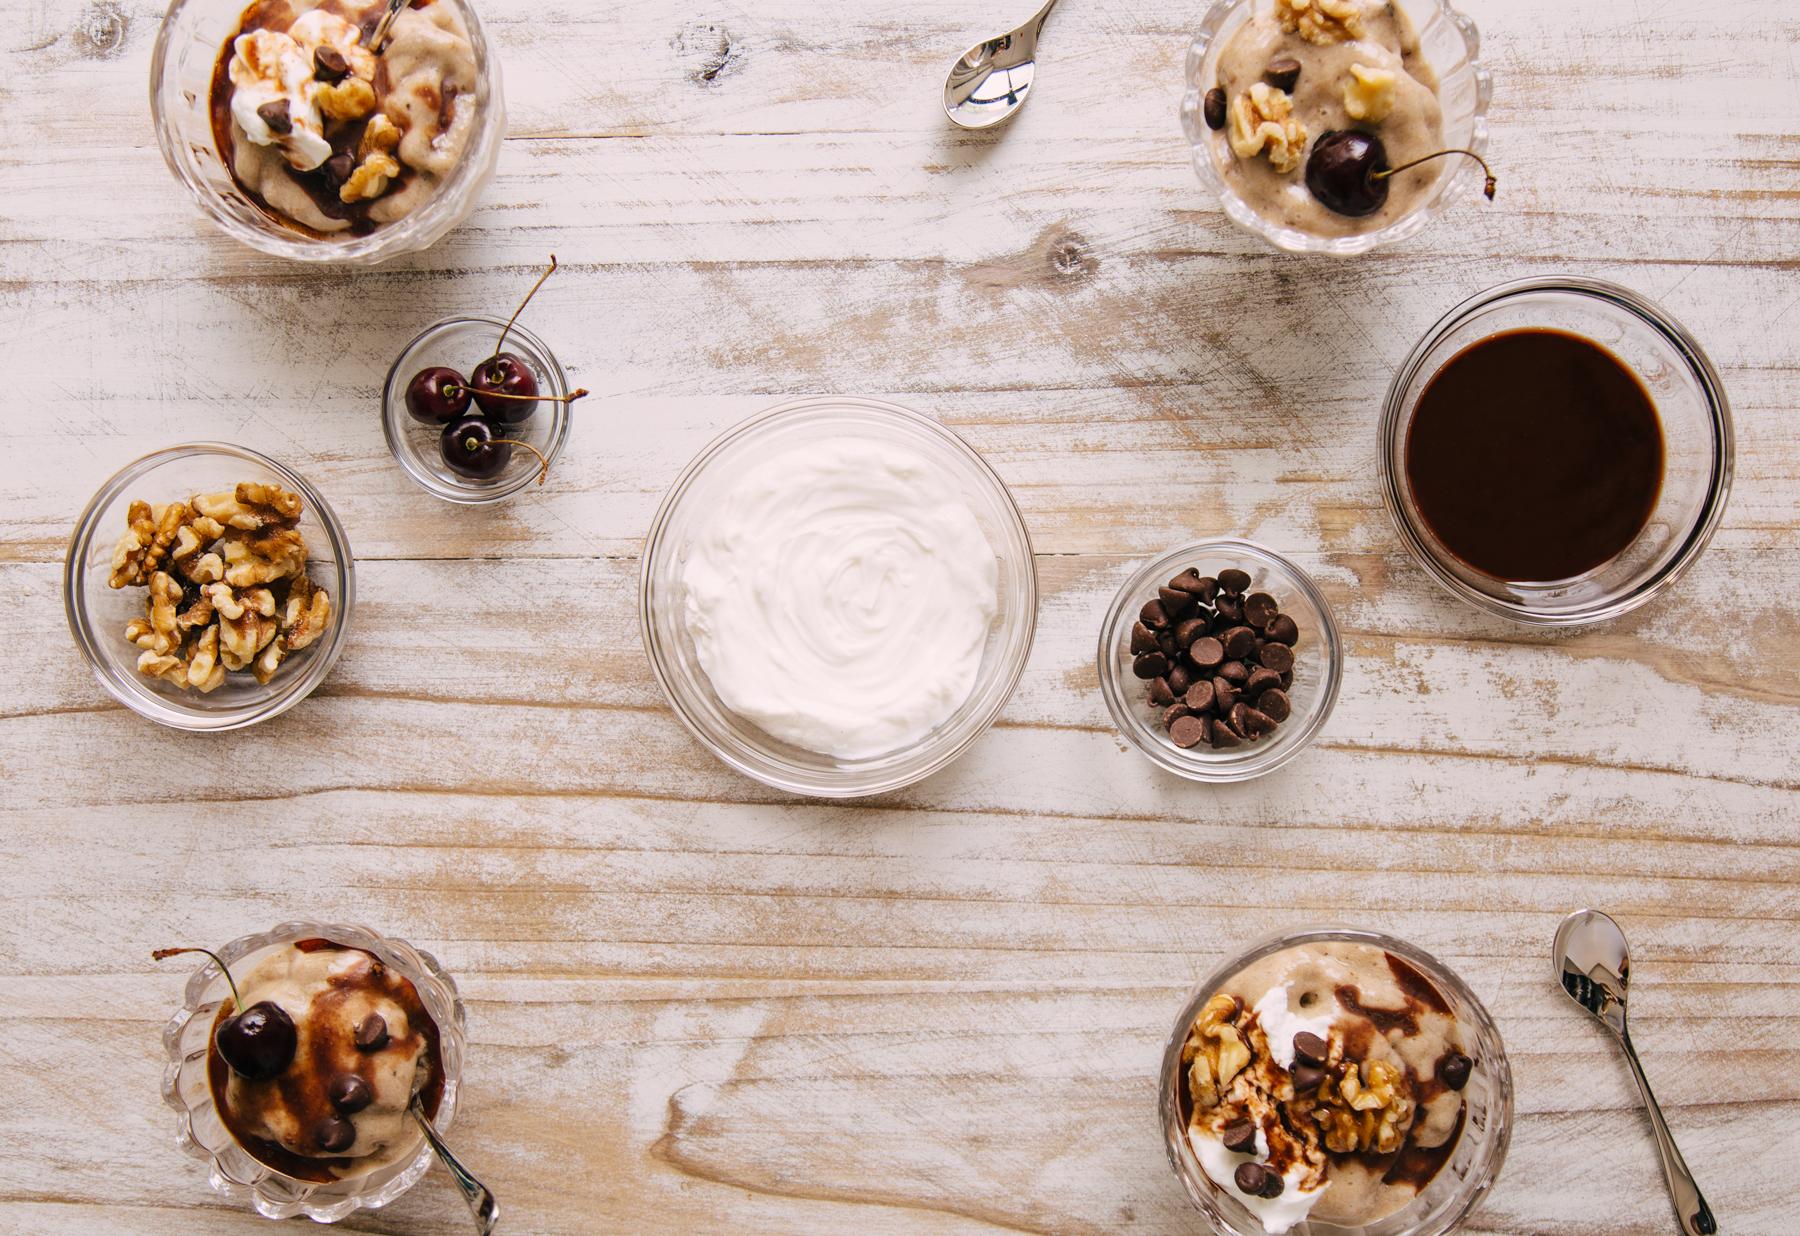 Healthy Ice Cream Sundae: This Recipe Wont Make You Feel Like Crap